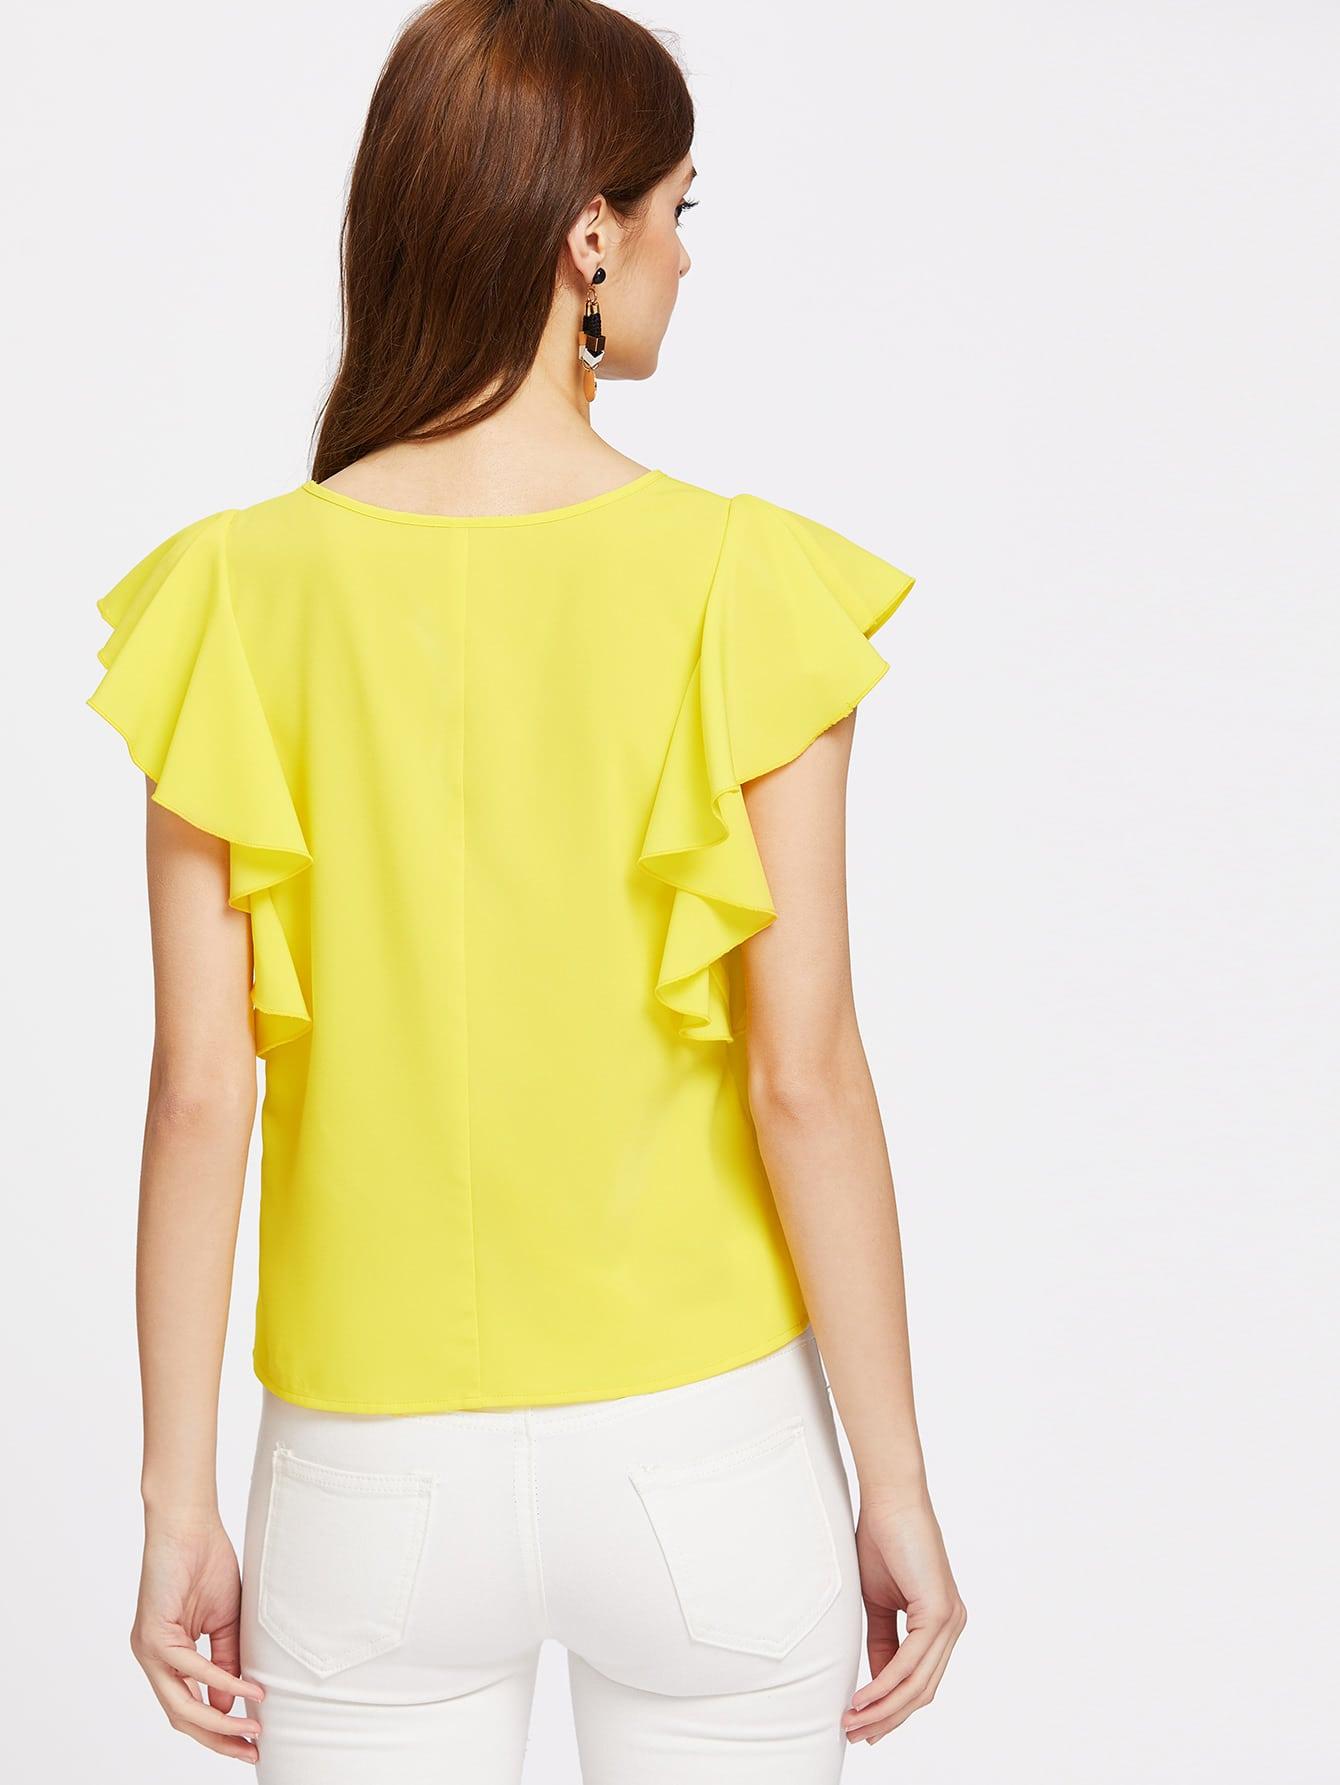 blouse170405712_2